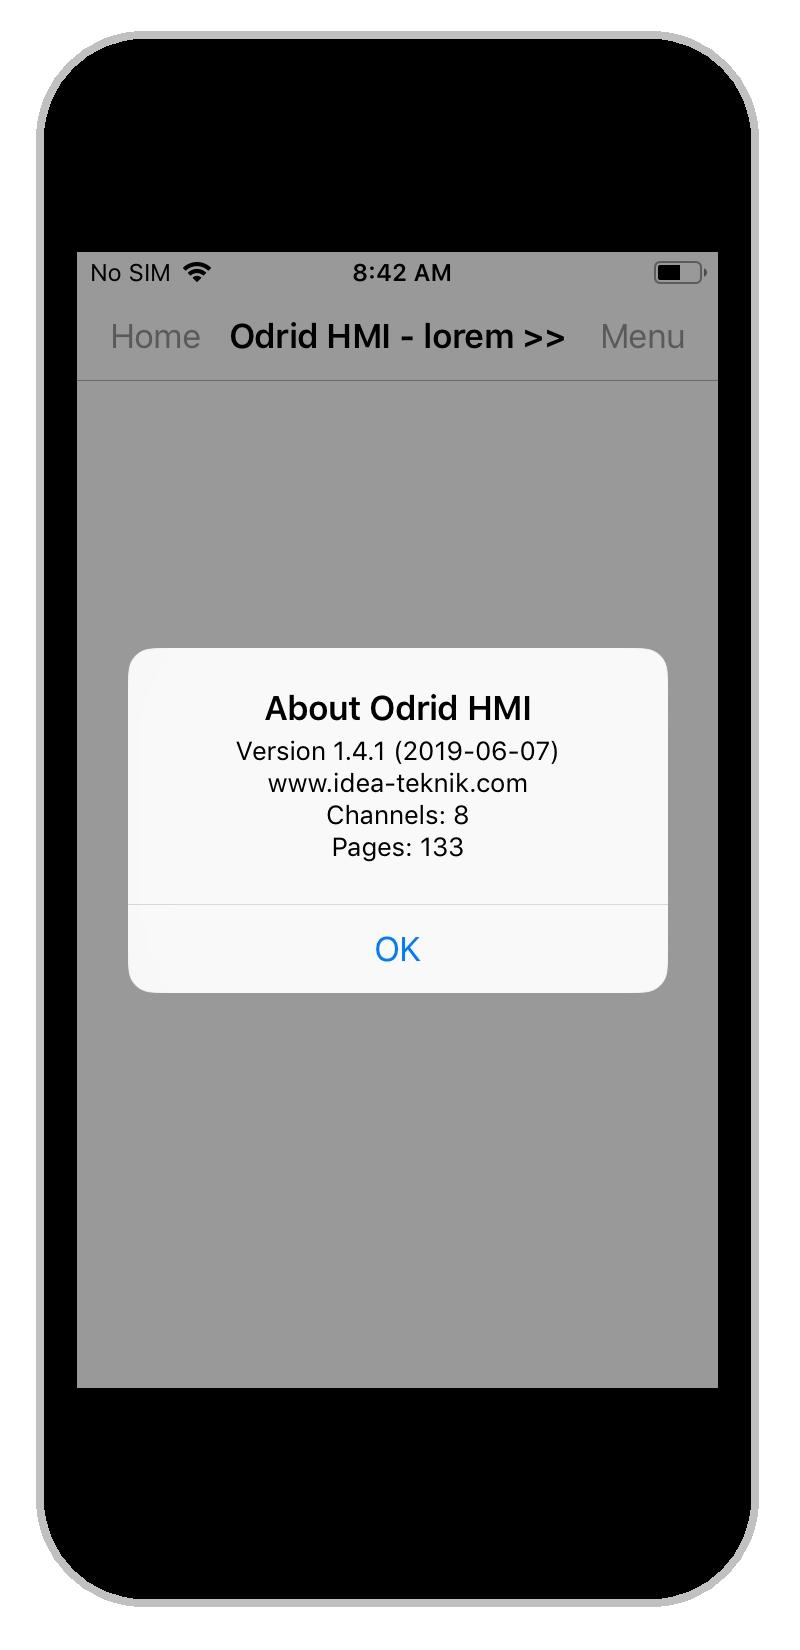 HMI Droid manual